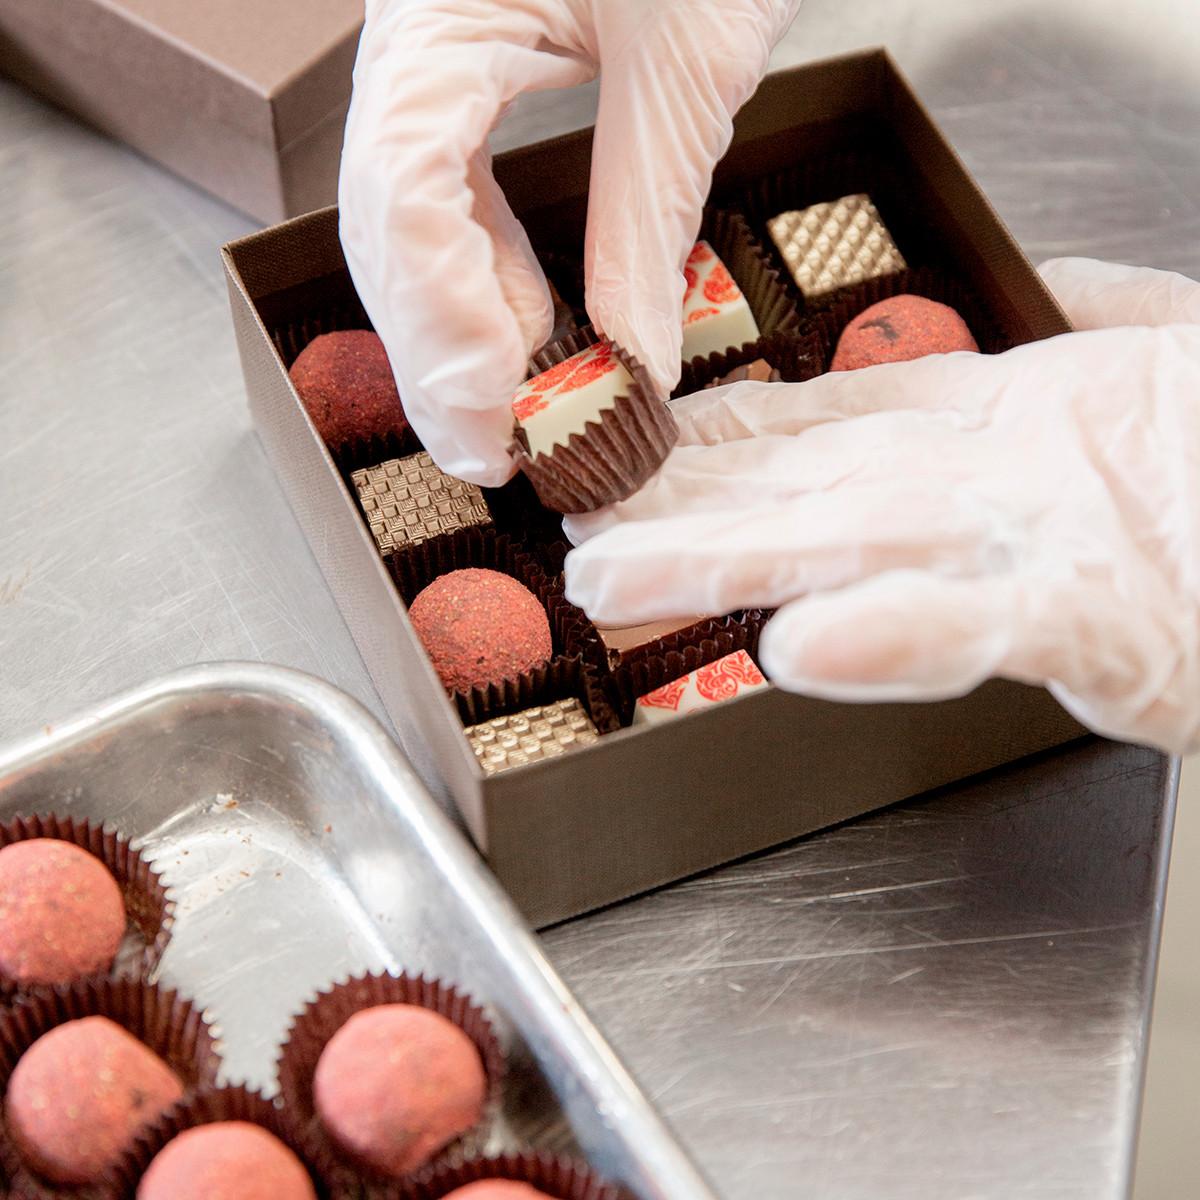 Carmen Portillo's chocolate truffles are handmade and beautiful.